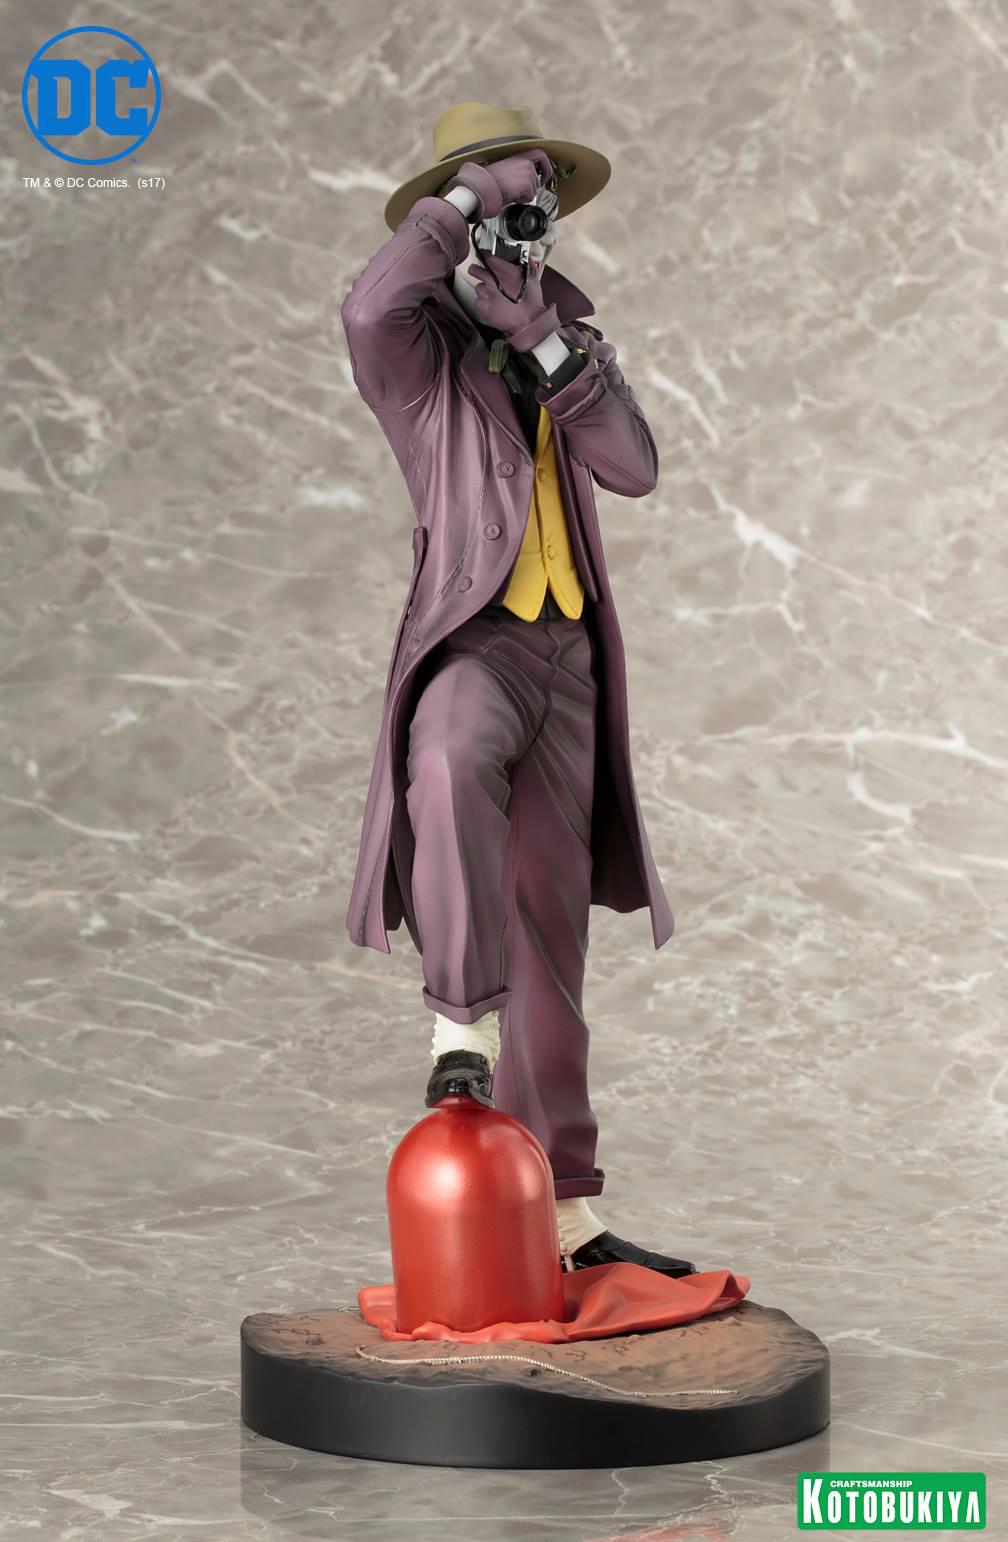 kotobukiya-joker-the-killing-joke-statue-3